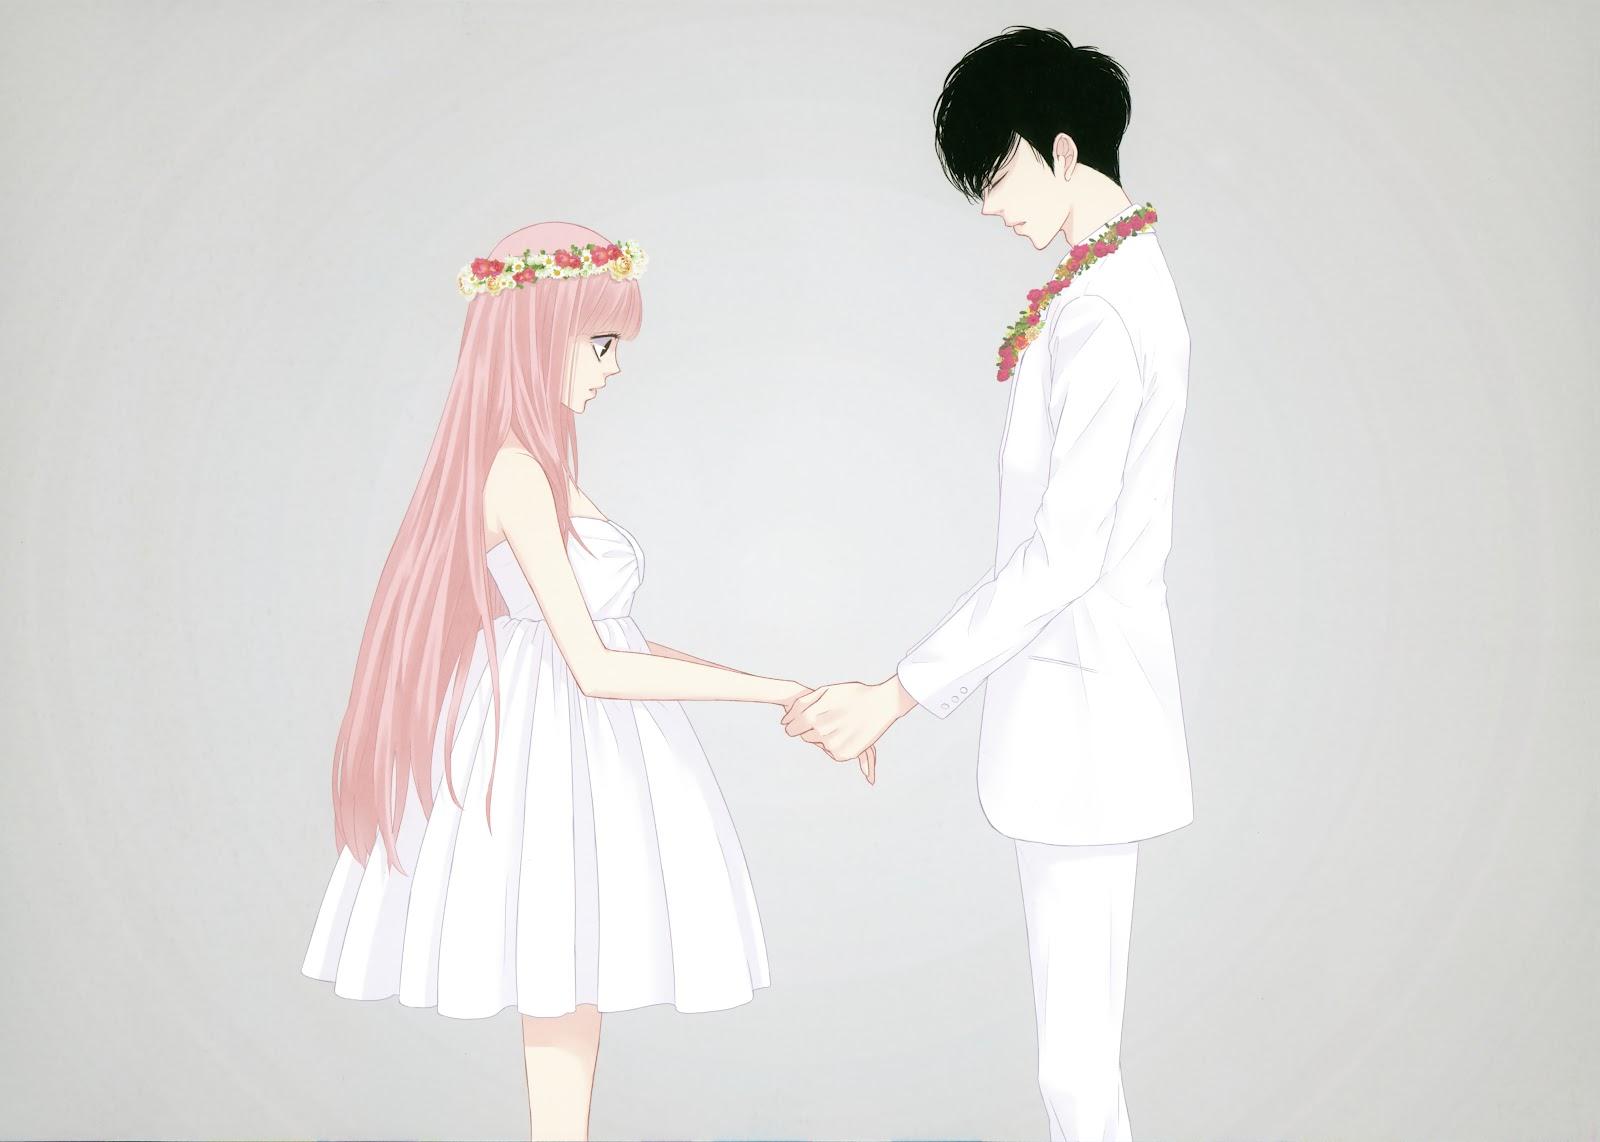 Mangá & Anime - Official: Luka Megurine